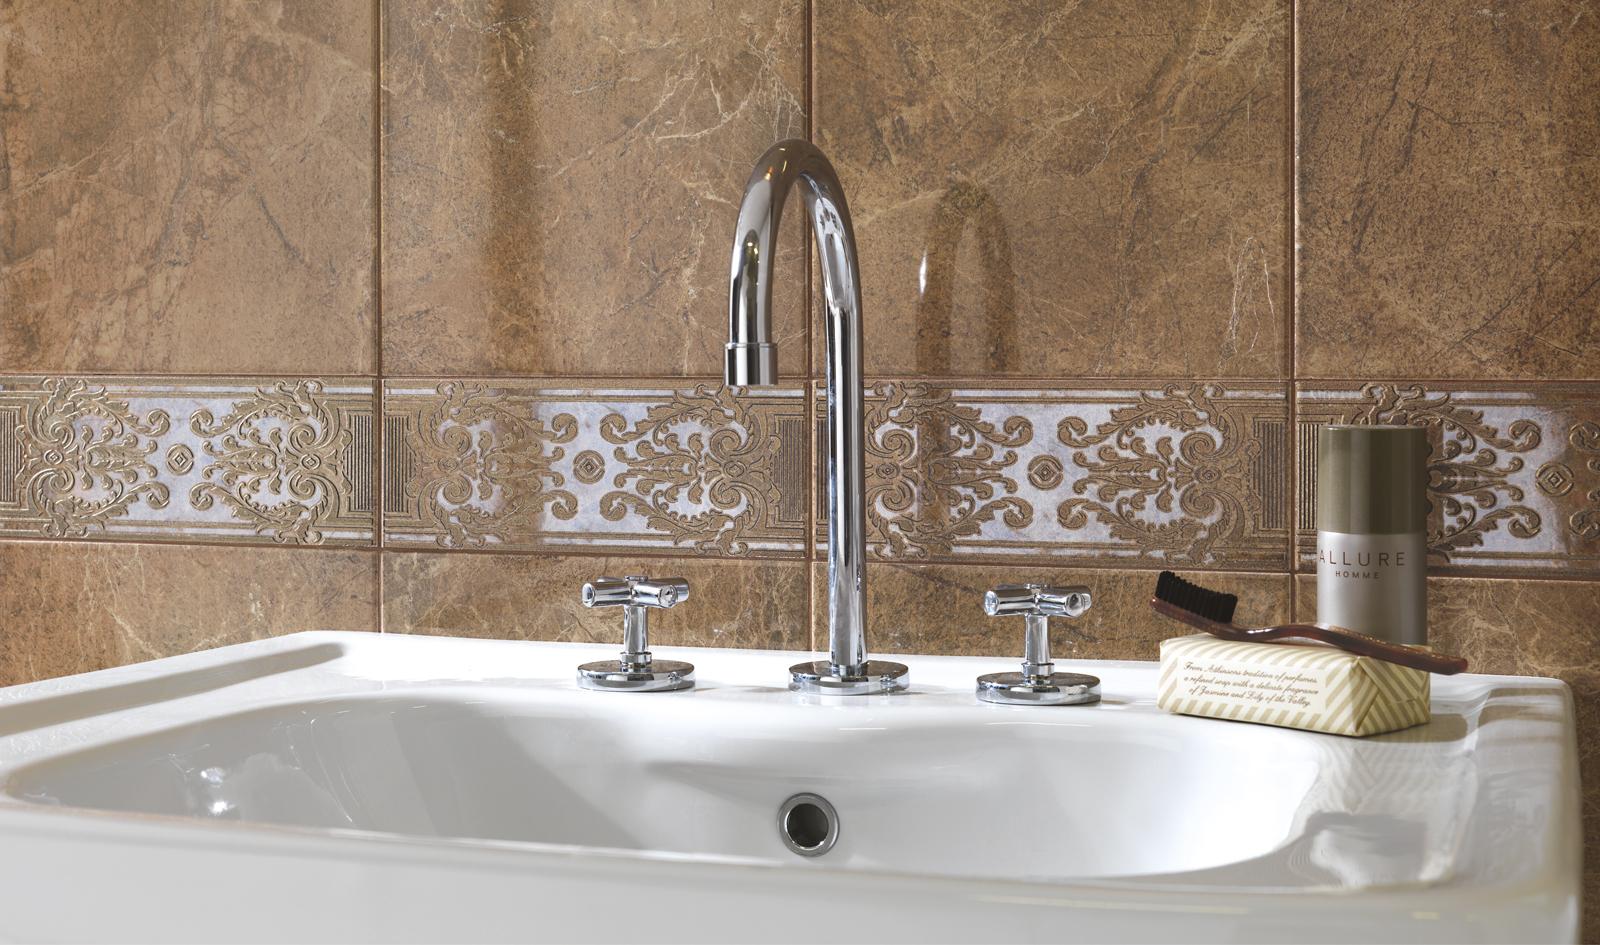 carreaux imitation marbre brillante avec des estompages ragno. Black Bedroom Furniture Sets. Home Design Ideas